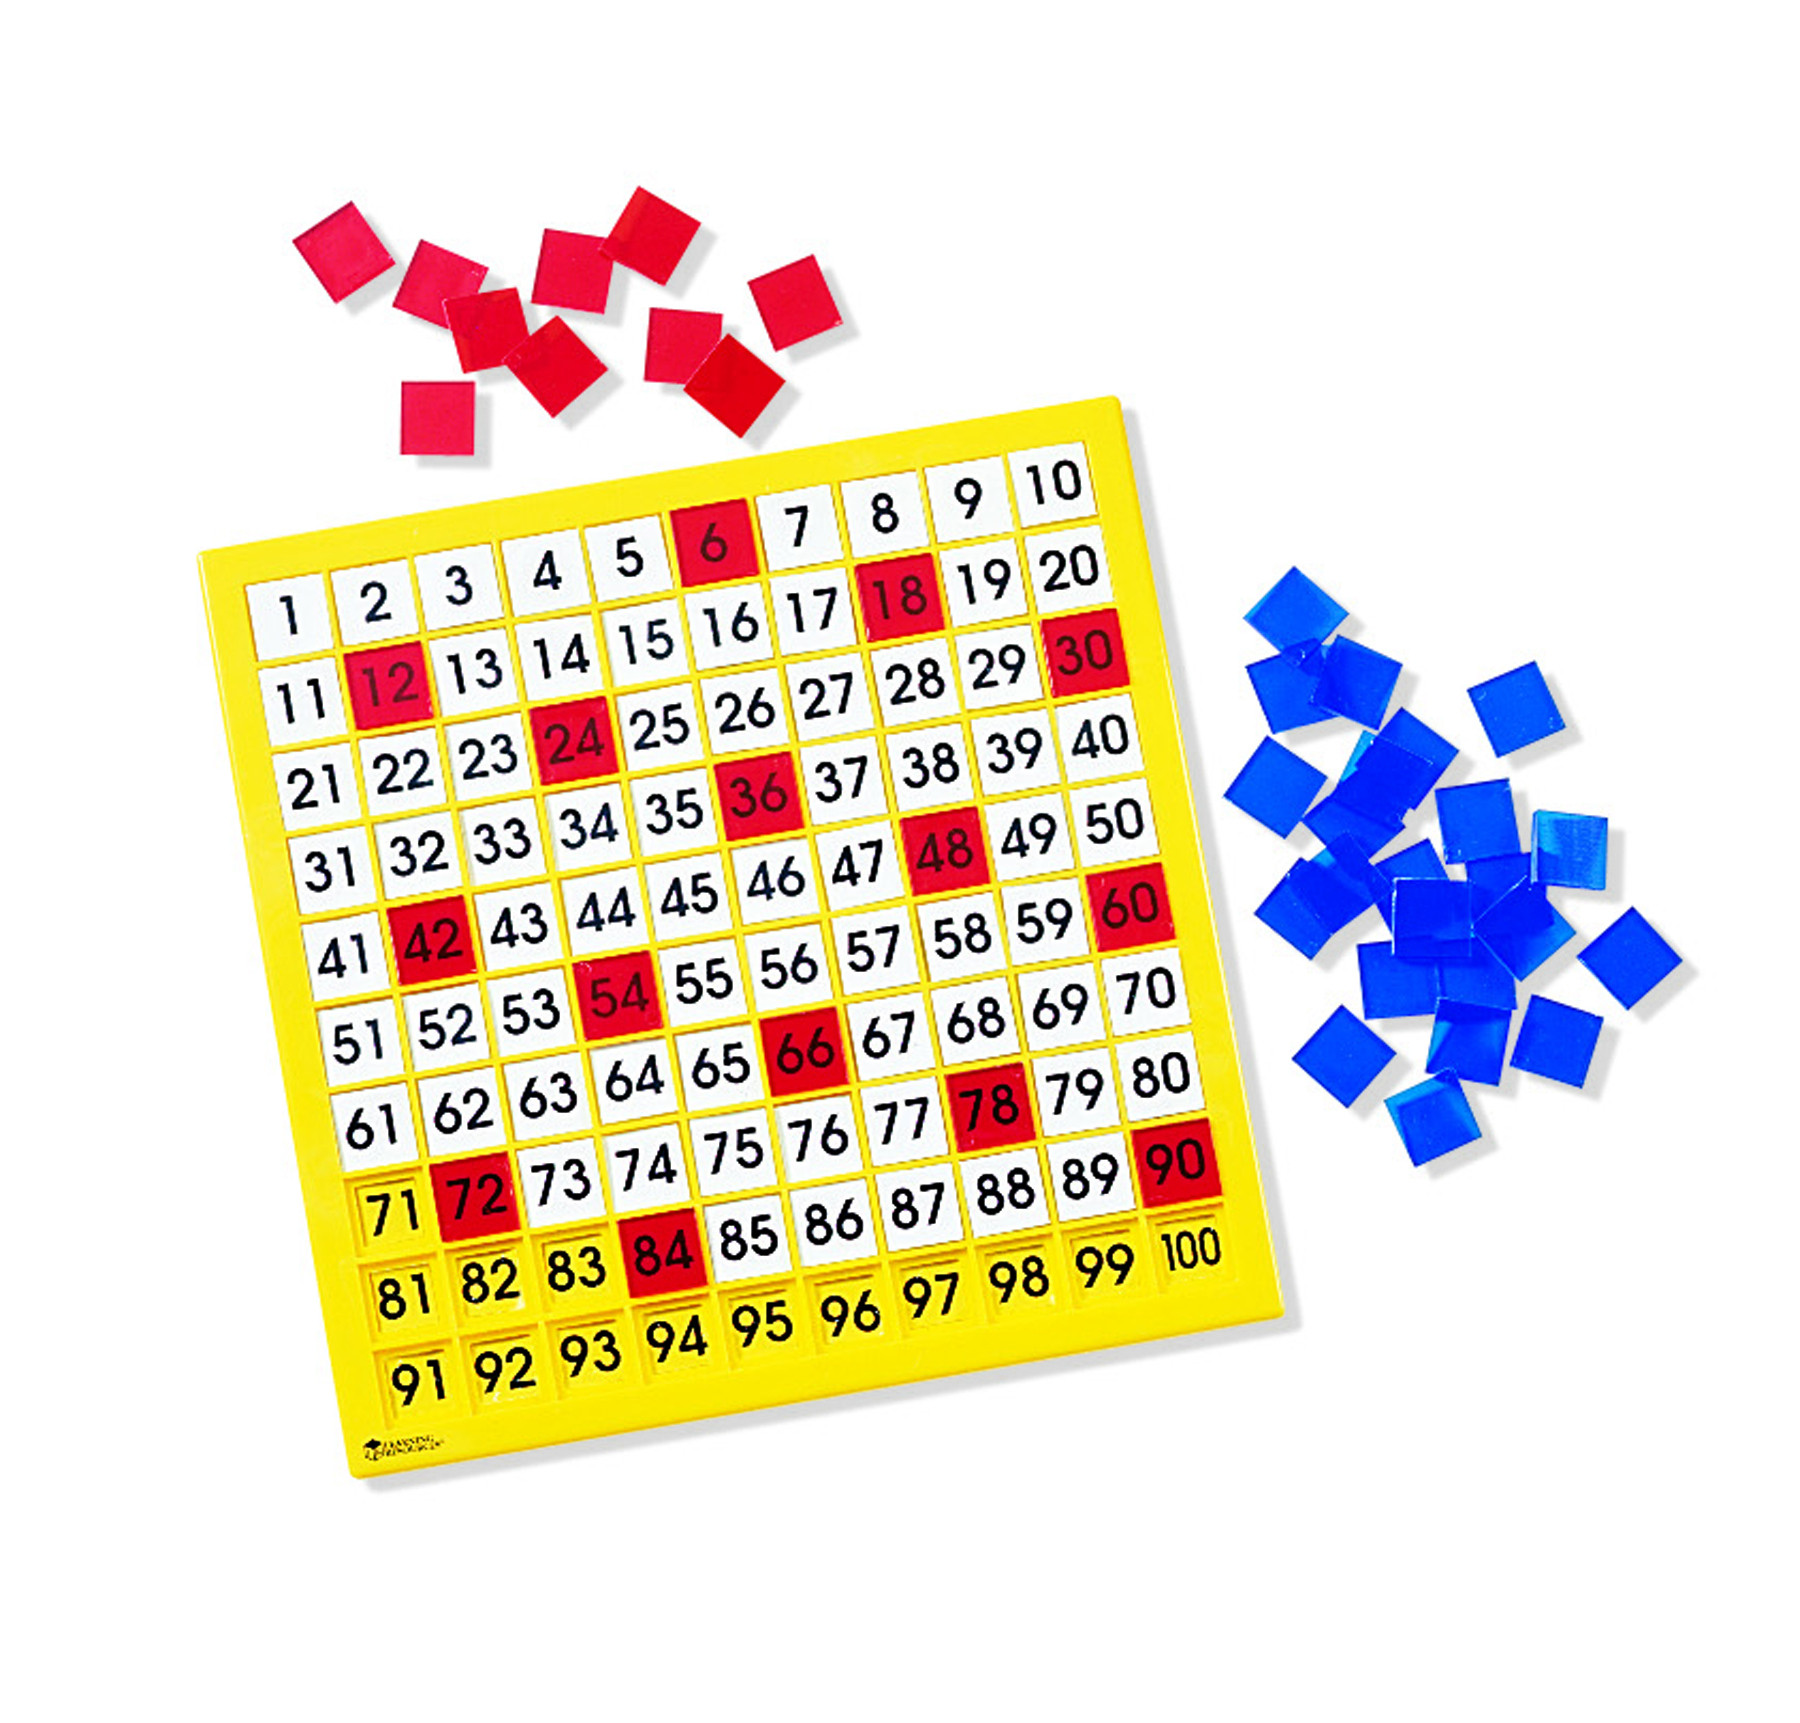 TABLA NUMÉRICA 30 X 30